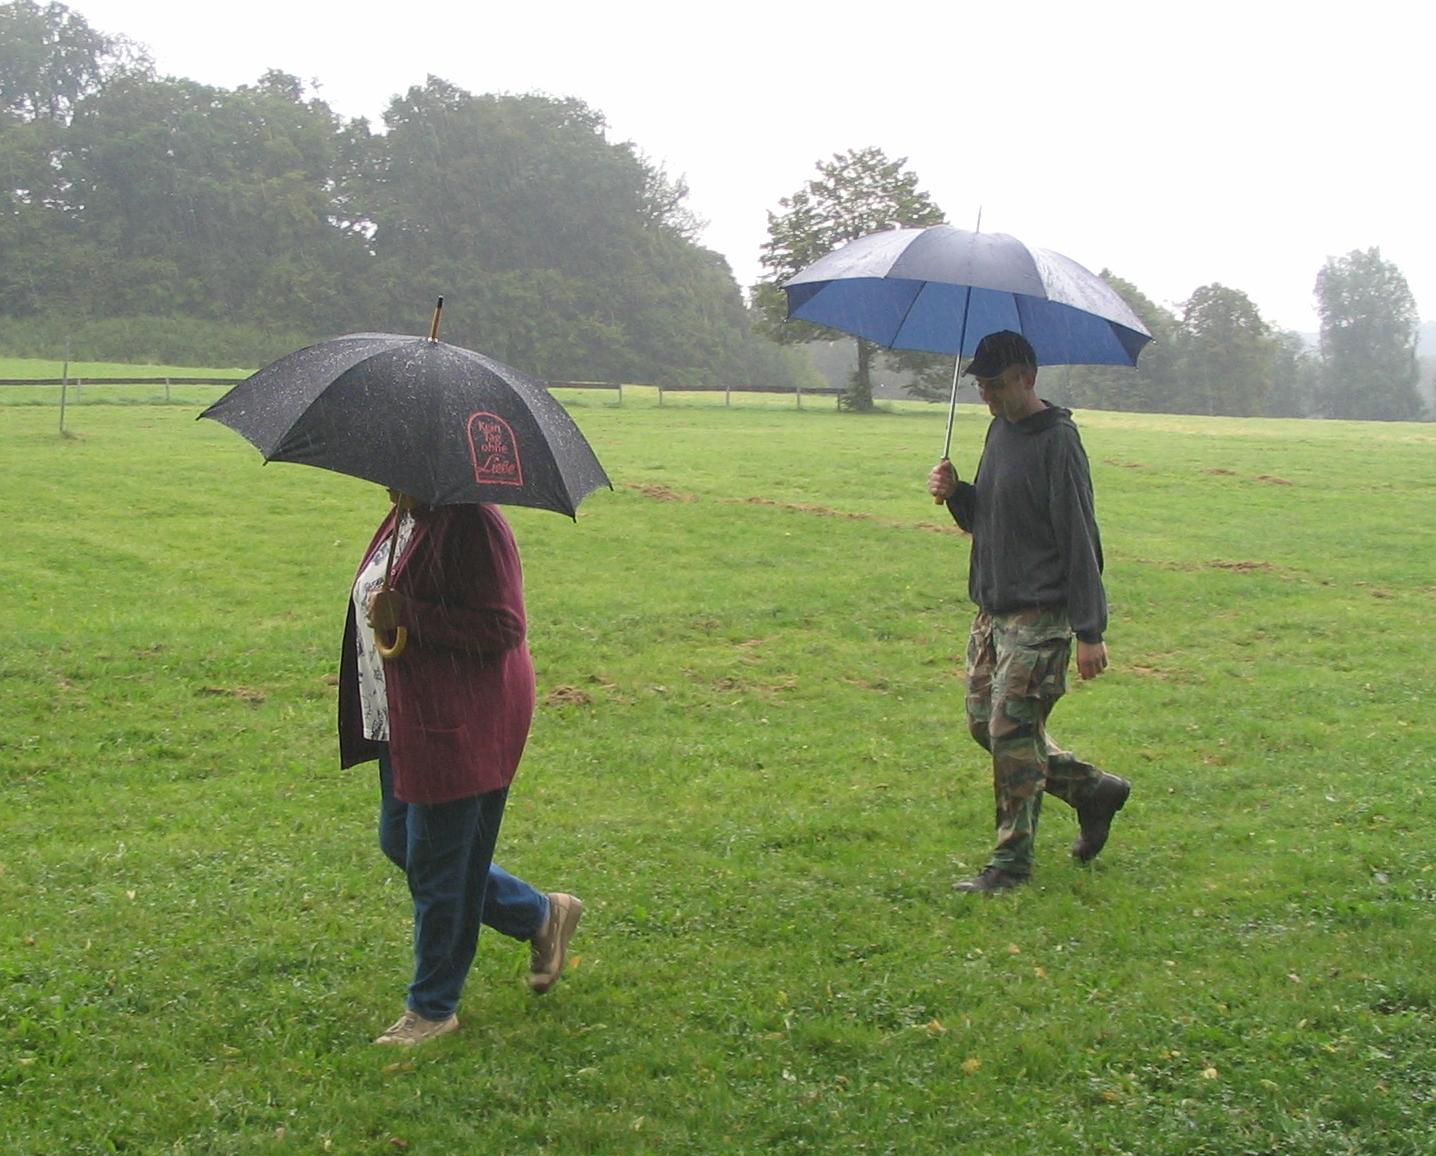 Schirm Bei Gewitter